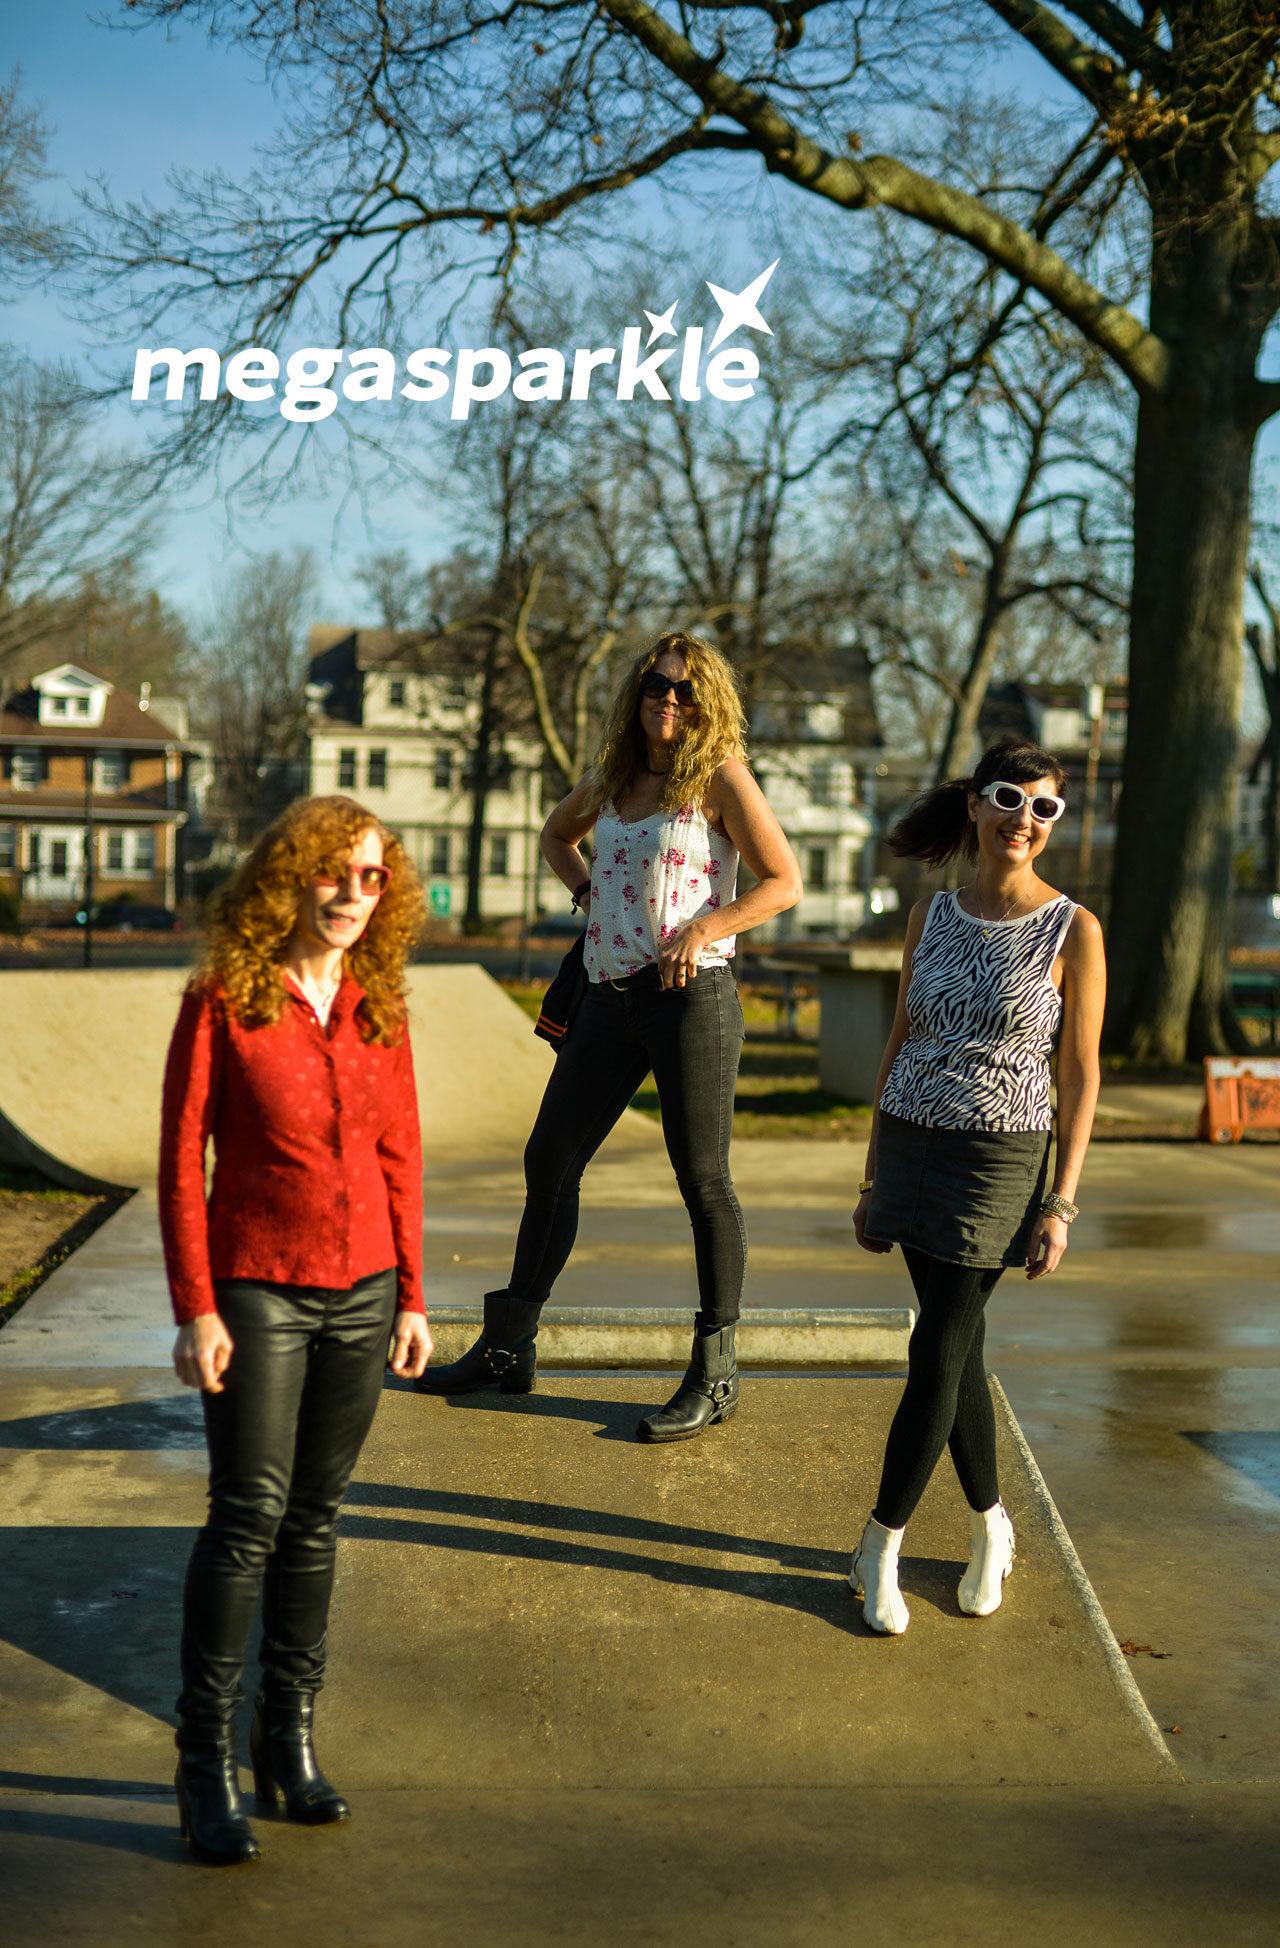 Megasparkle